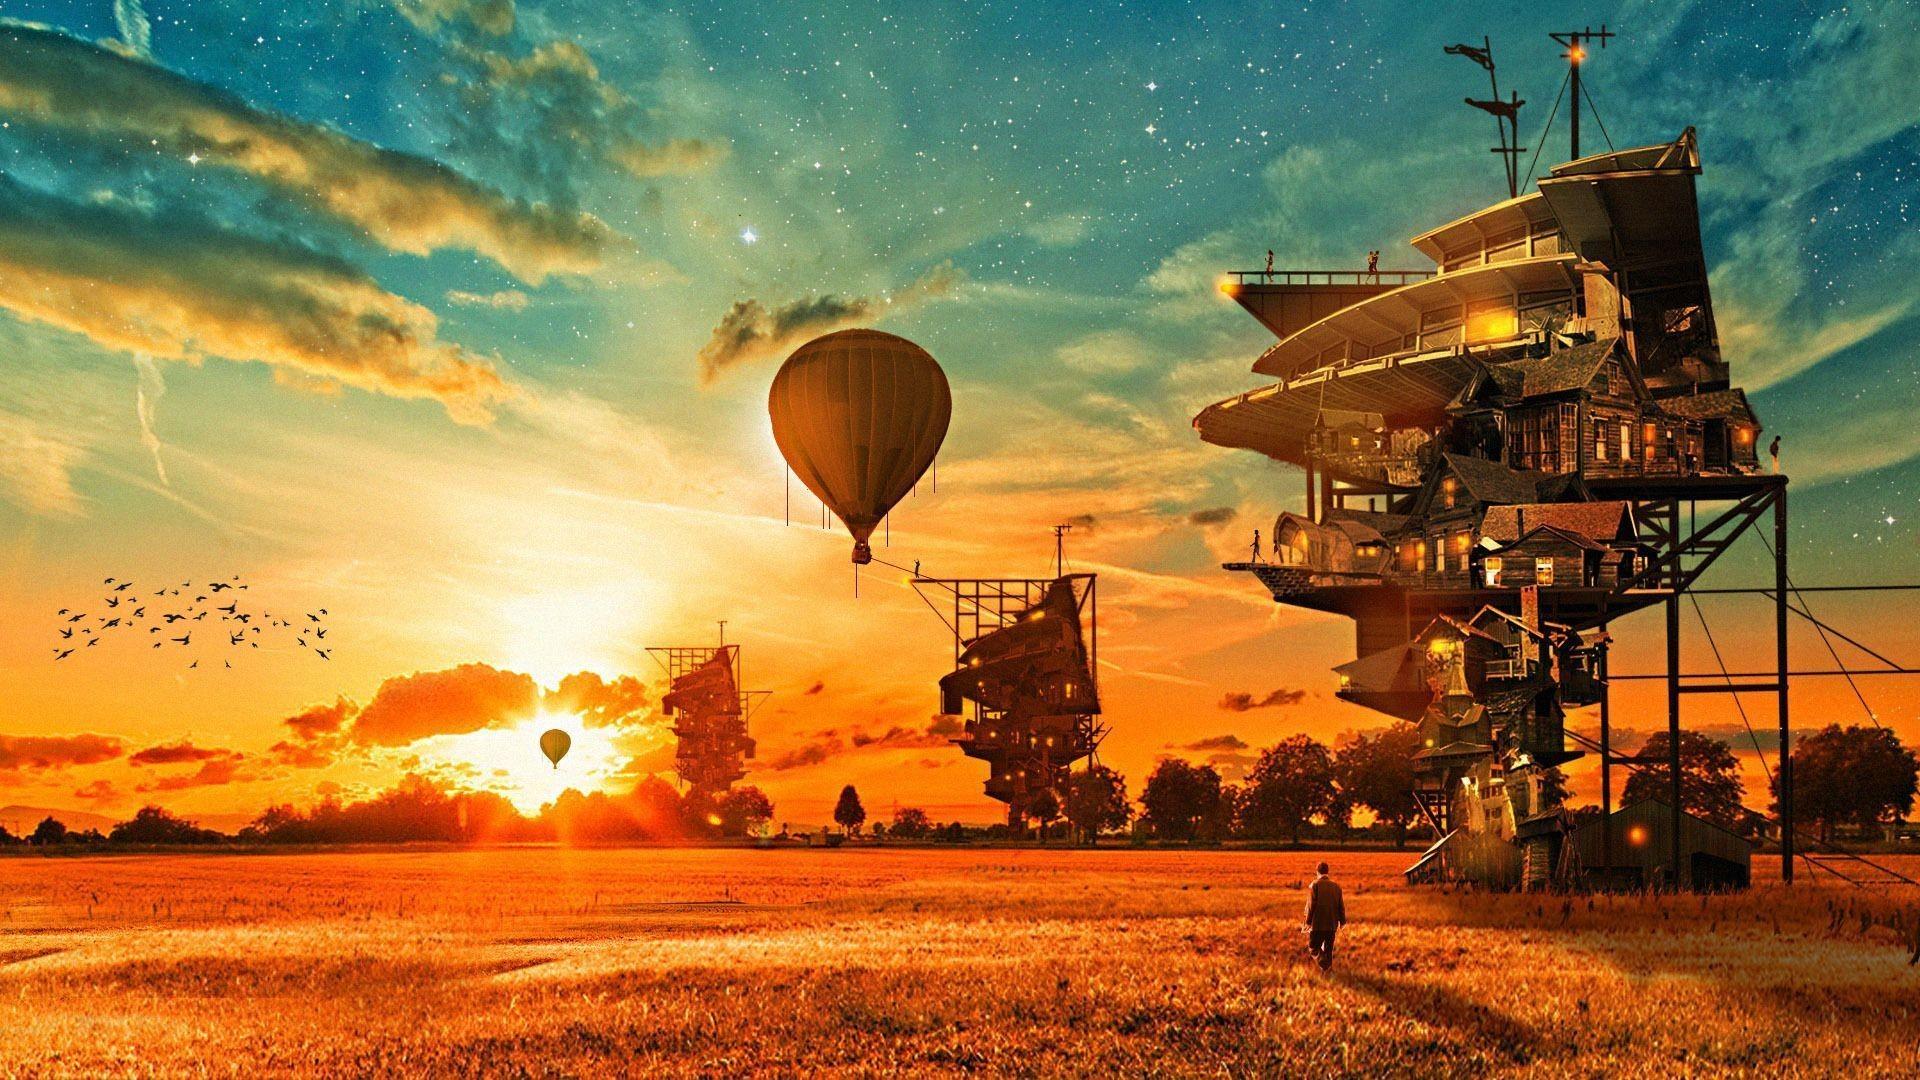 Houses Aerostat Fantasy balloon steampunk wallpaper